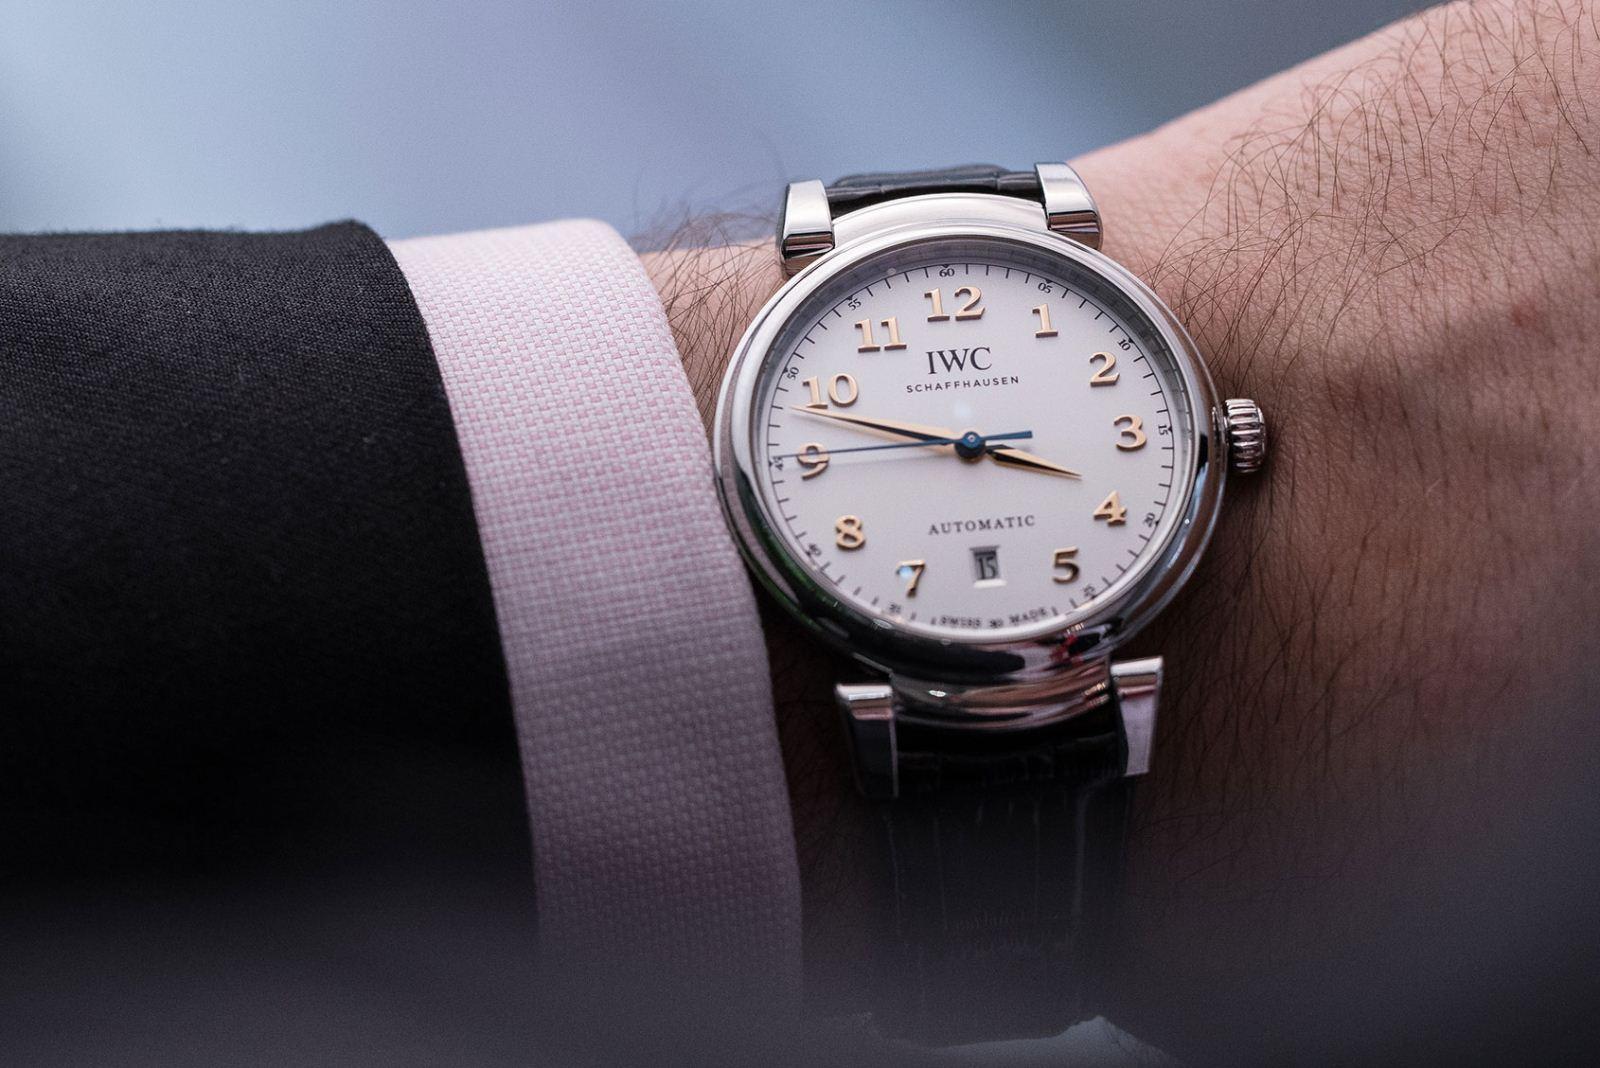 Đồng hồ IWC Da Vinci Automatic